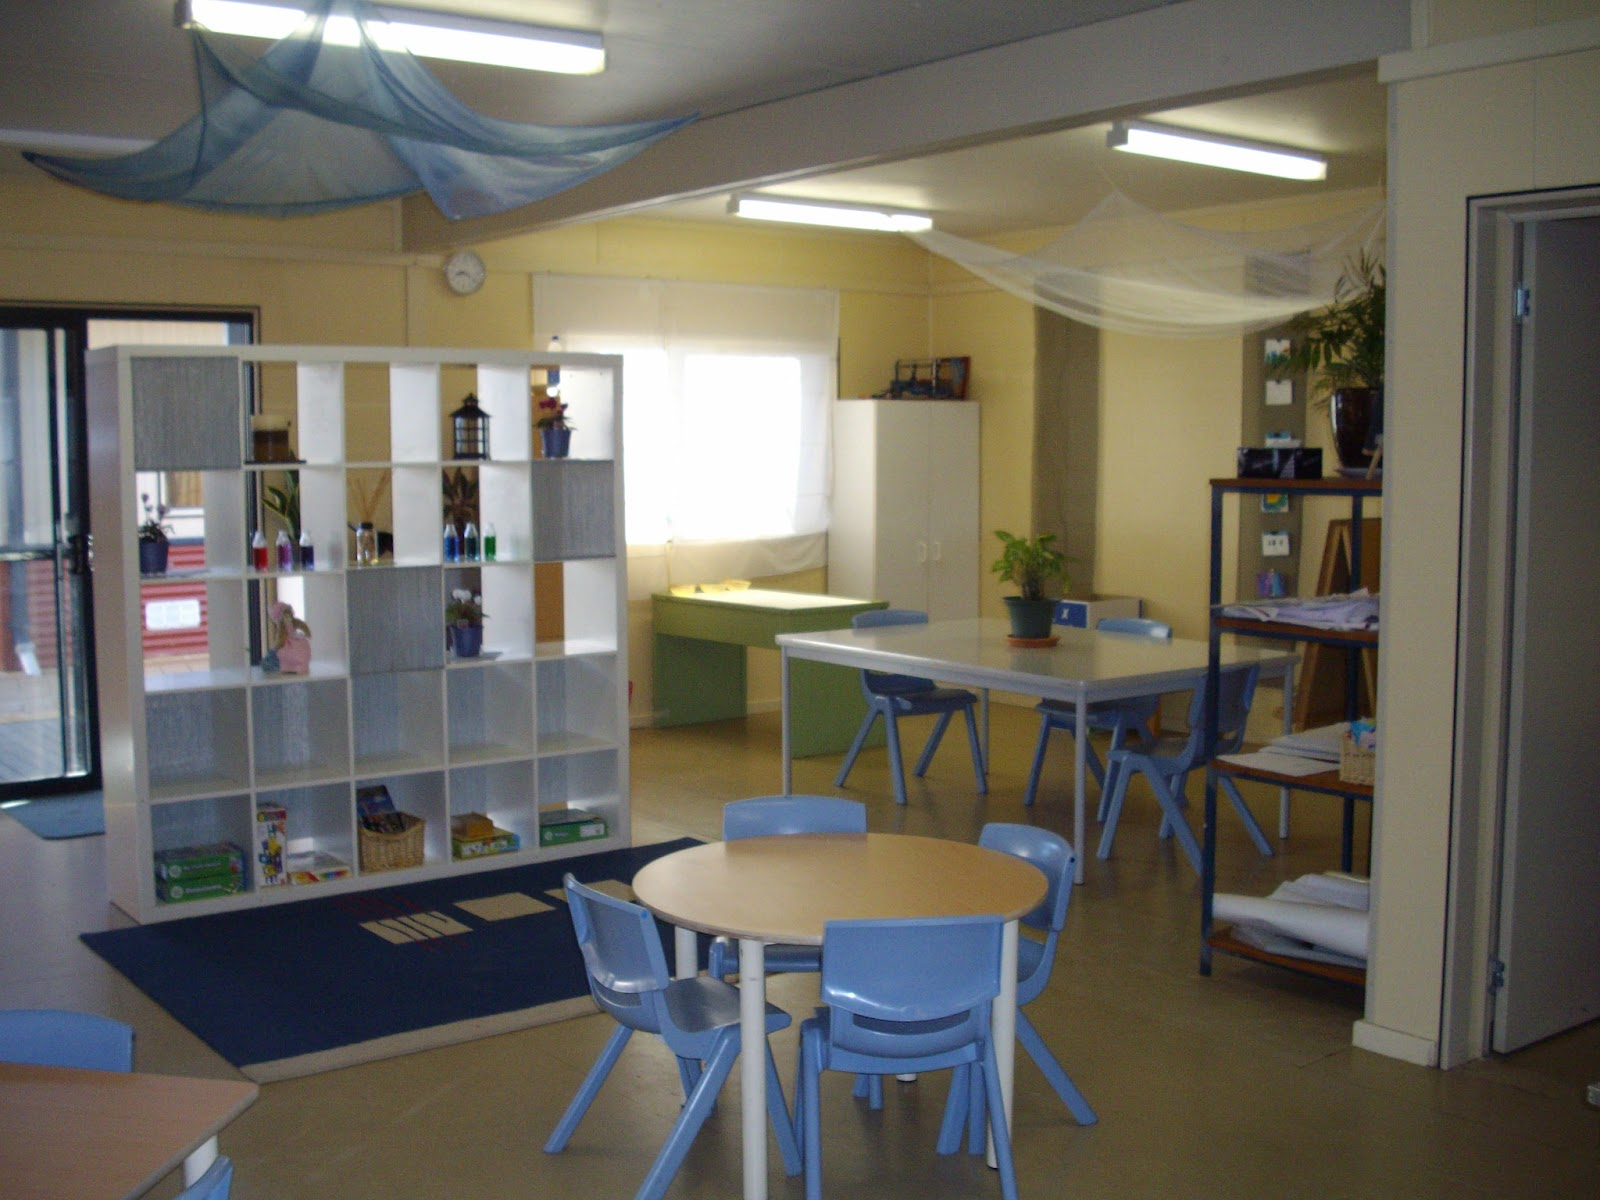 classroom - photo #33